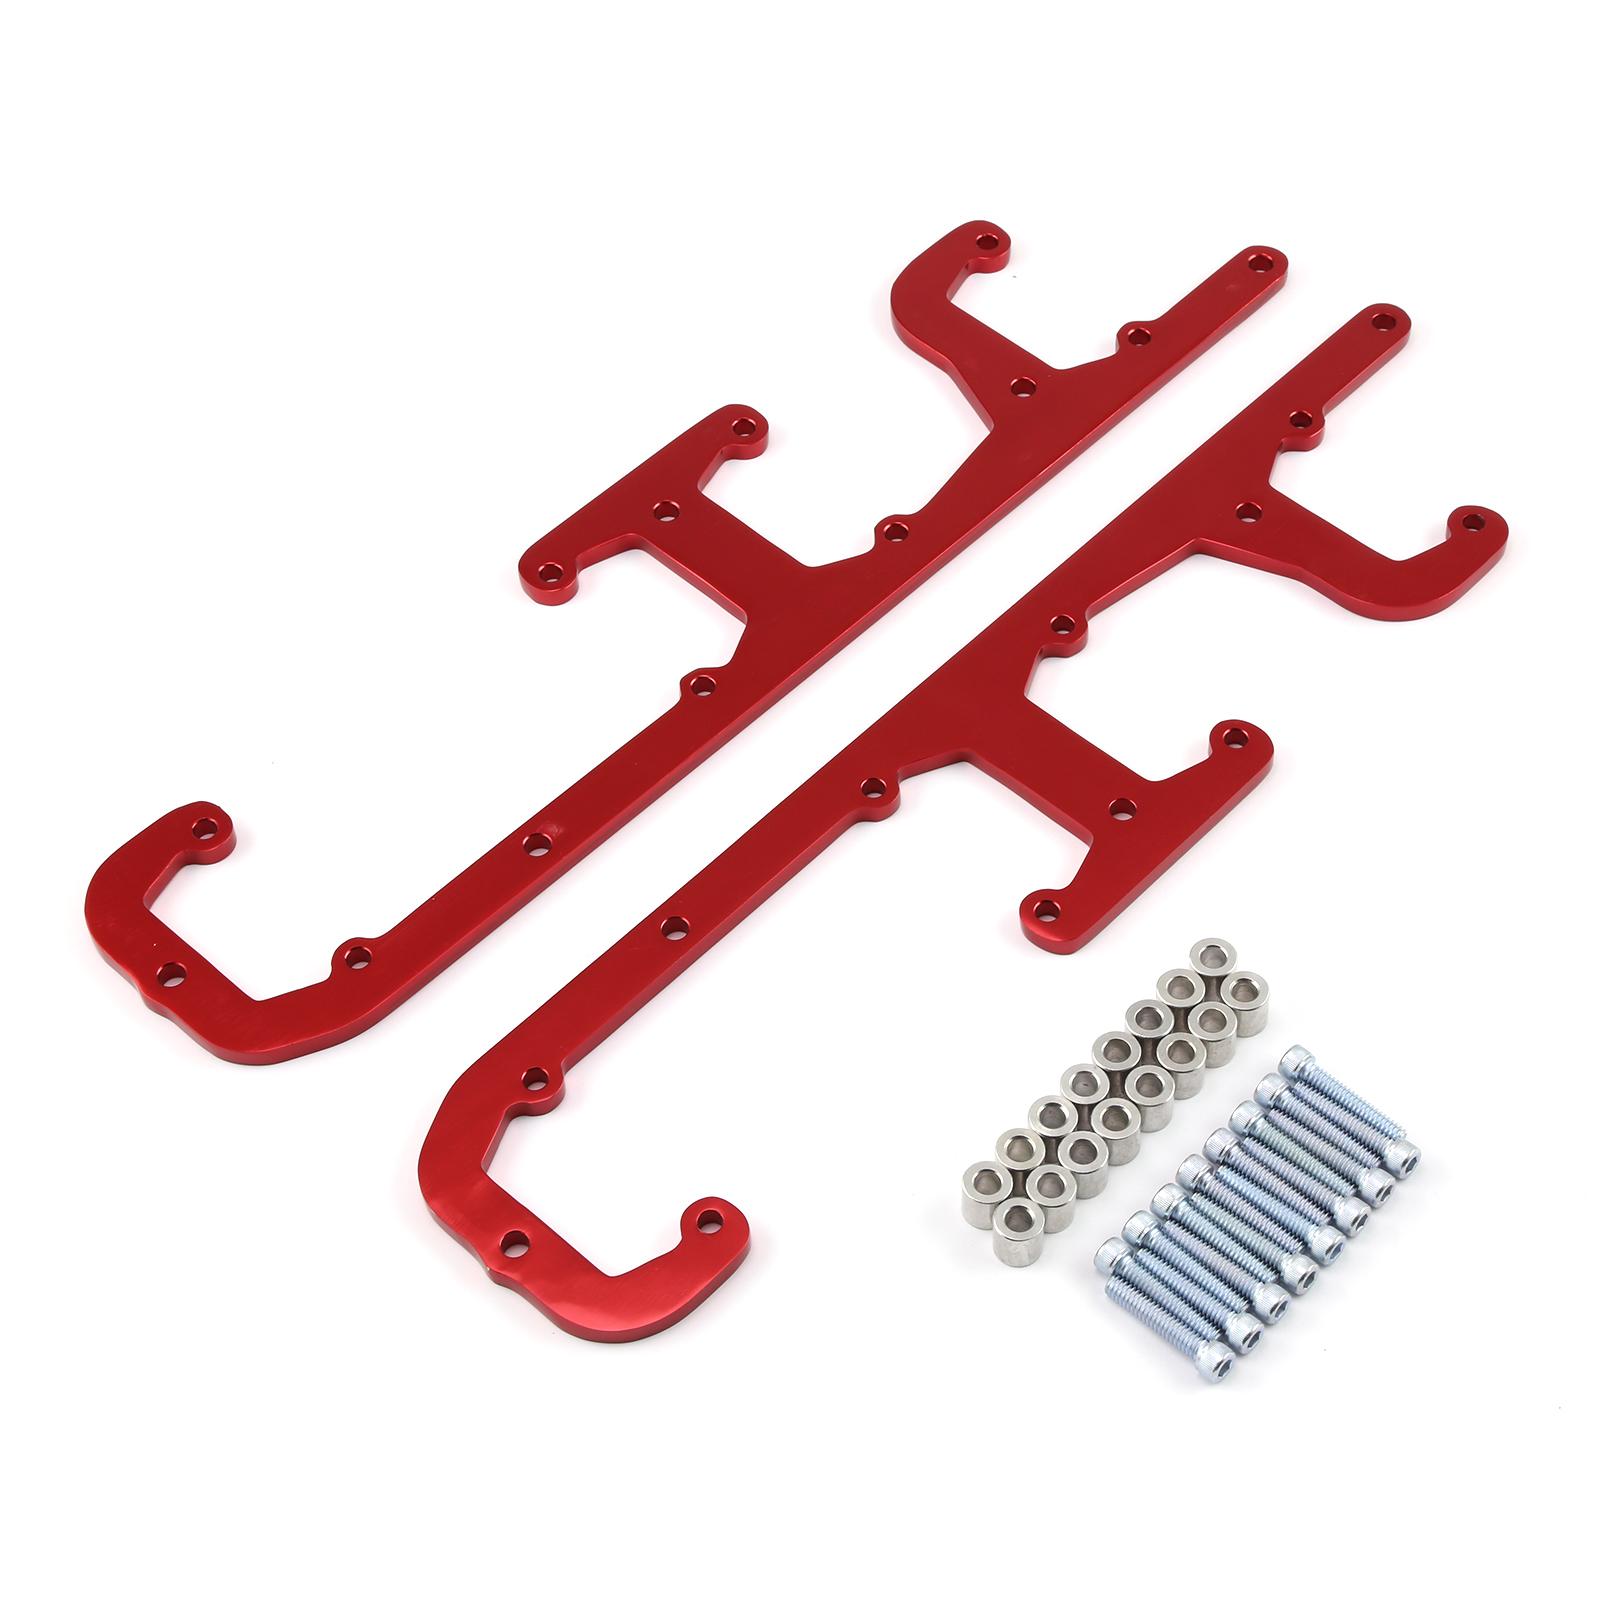 LS Series Red Billet Aluminum Coil Pack Bracket Kit with Hardware